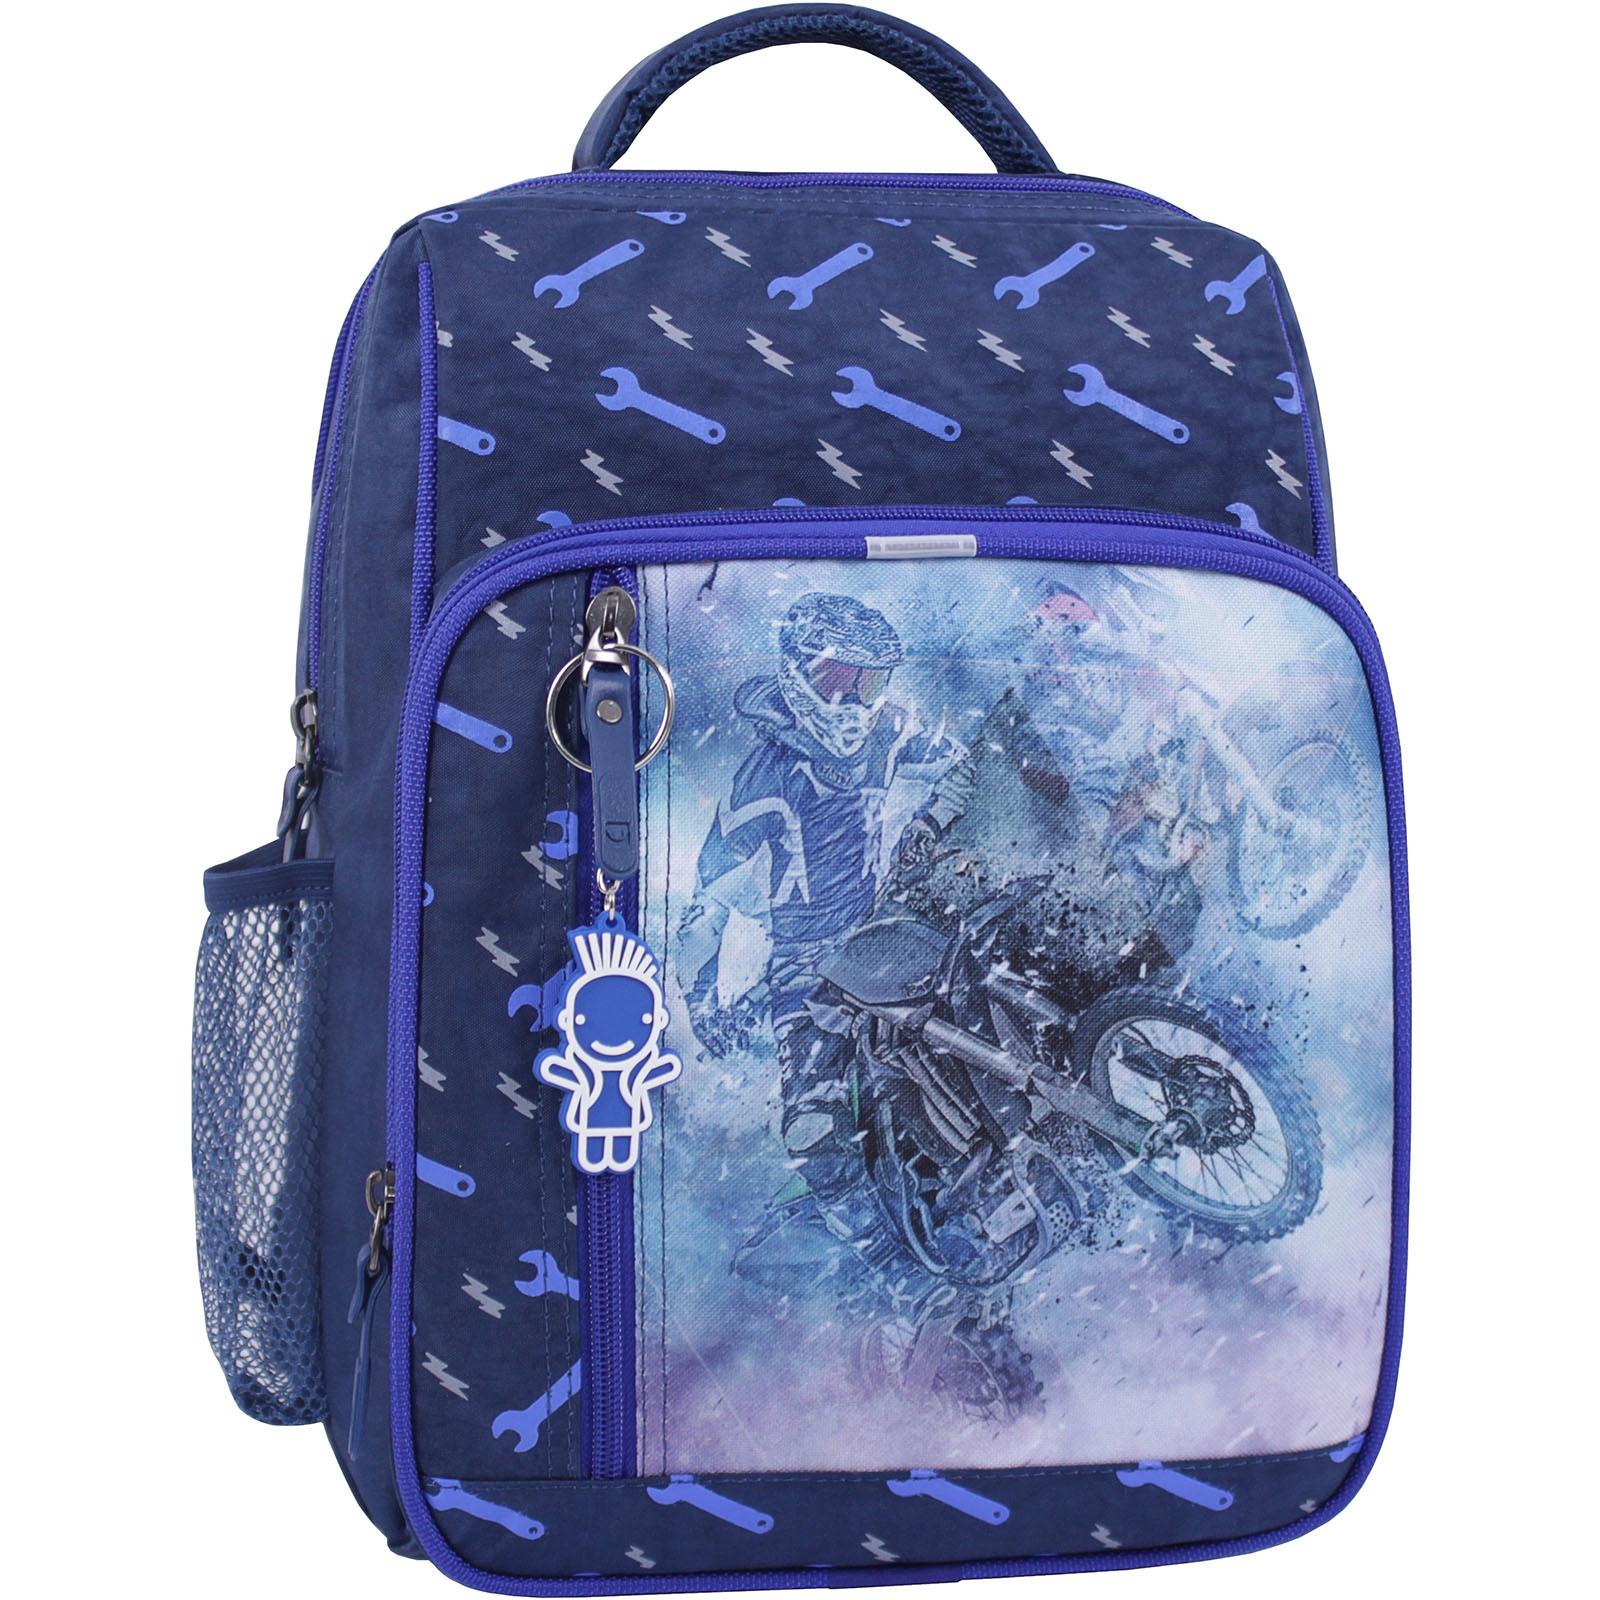 Школьные рюкзаки Рюкзак школьный Bagland Школьник 8 л. синий 534 (0012870) IMG_1037_суб.534_.JPG